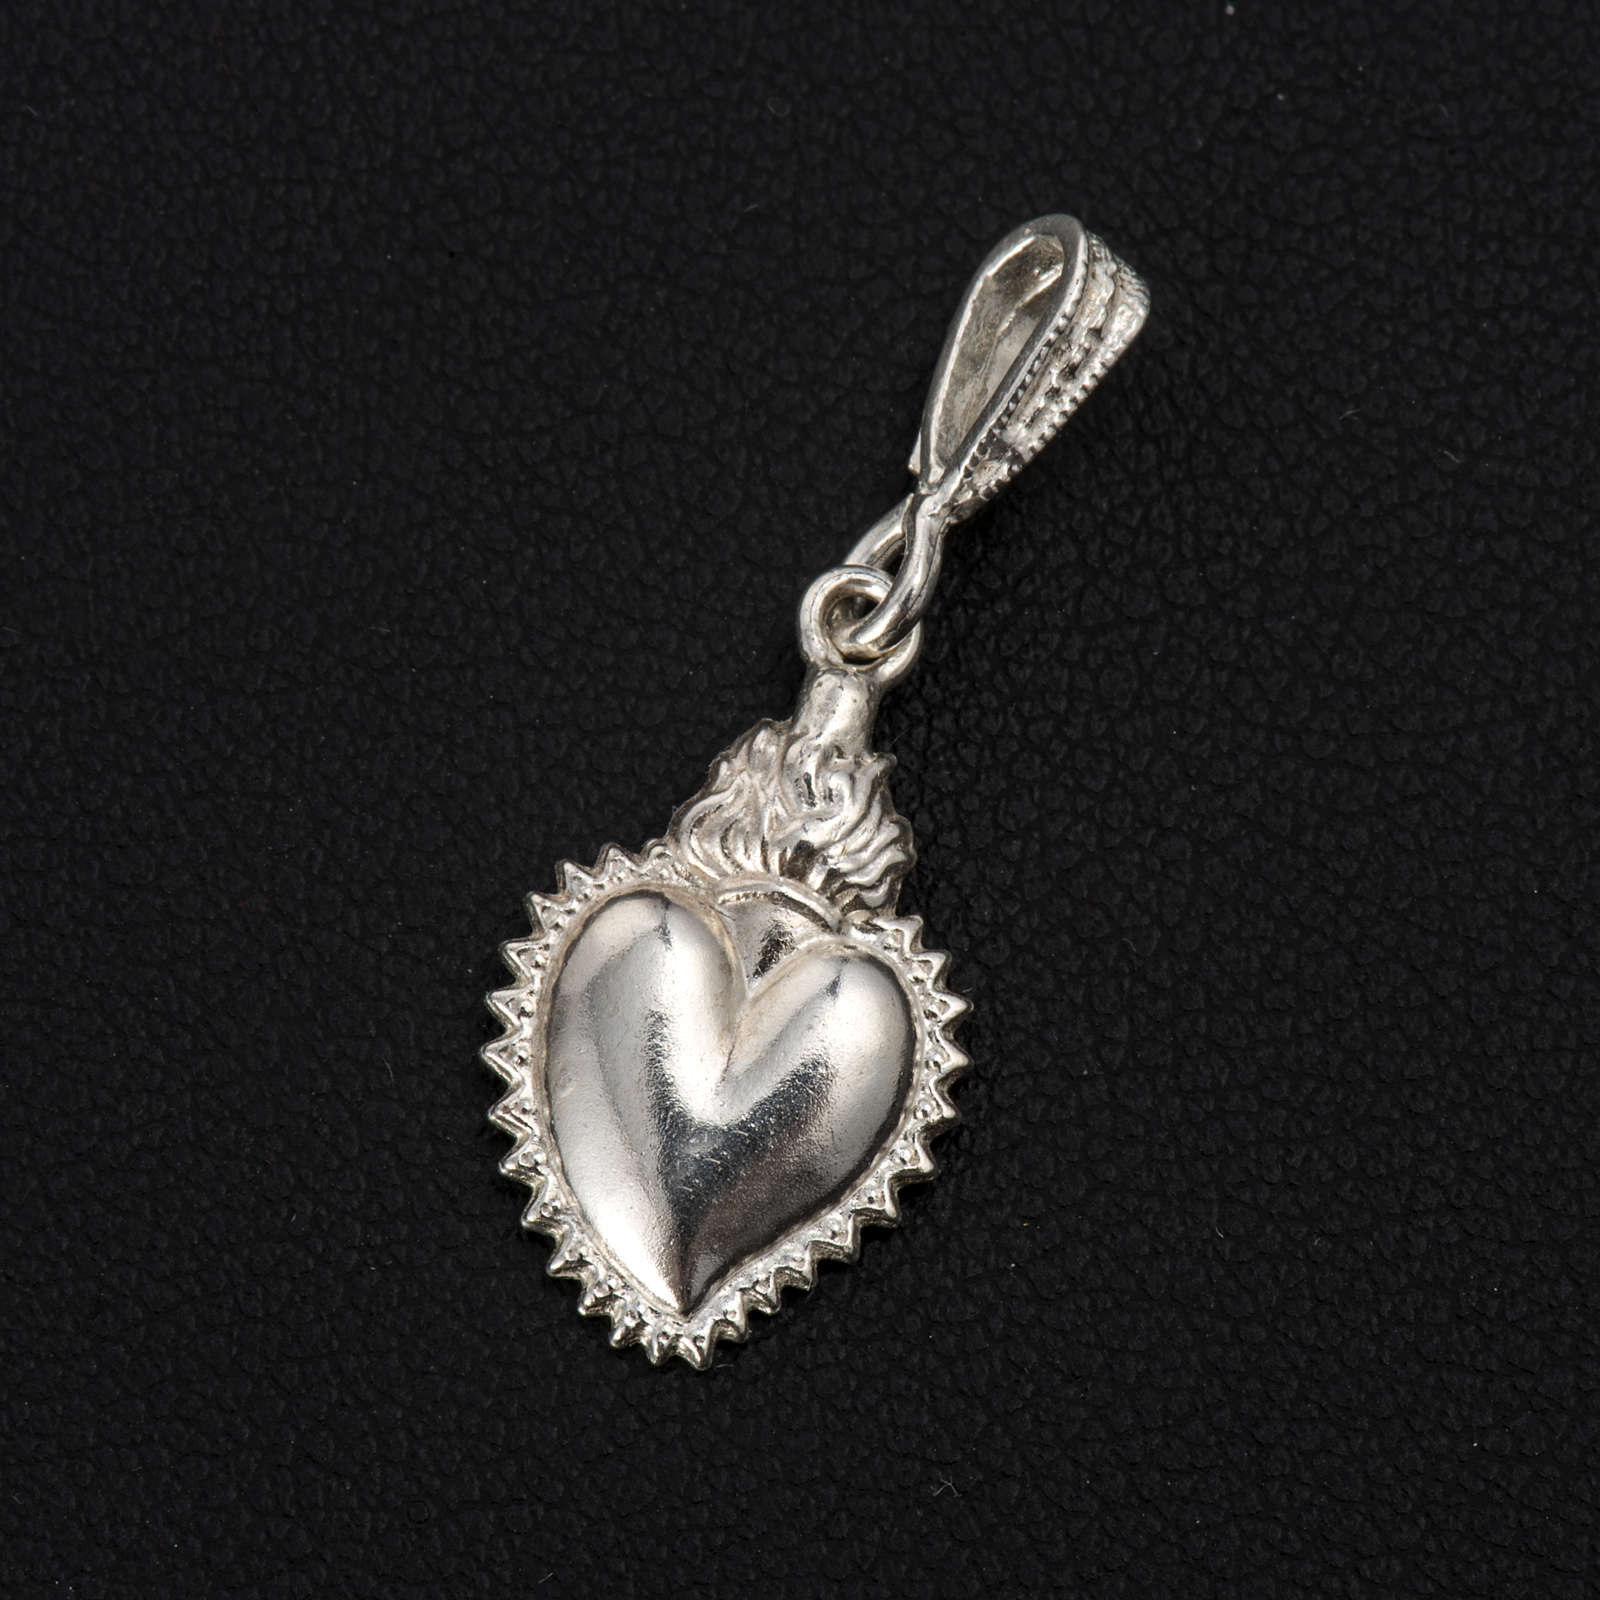 Colgante ex-voto forma corazón plata 800 4